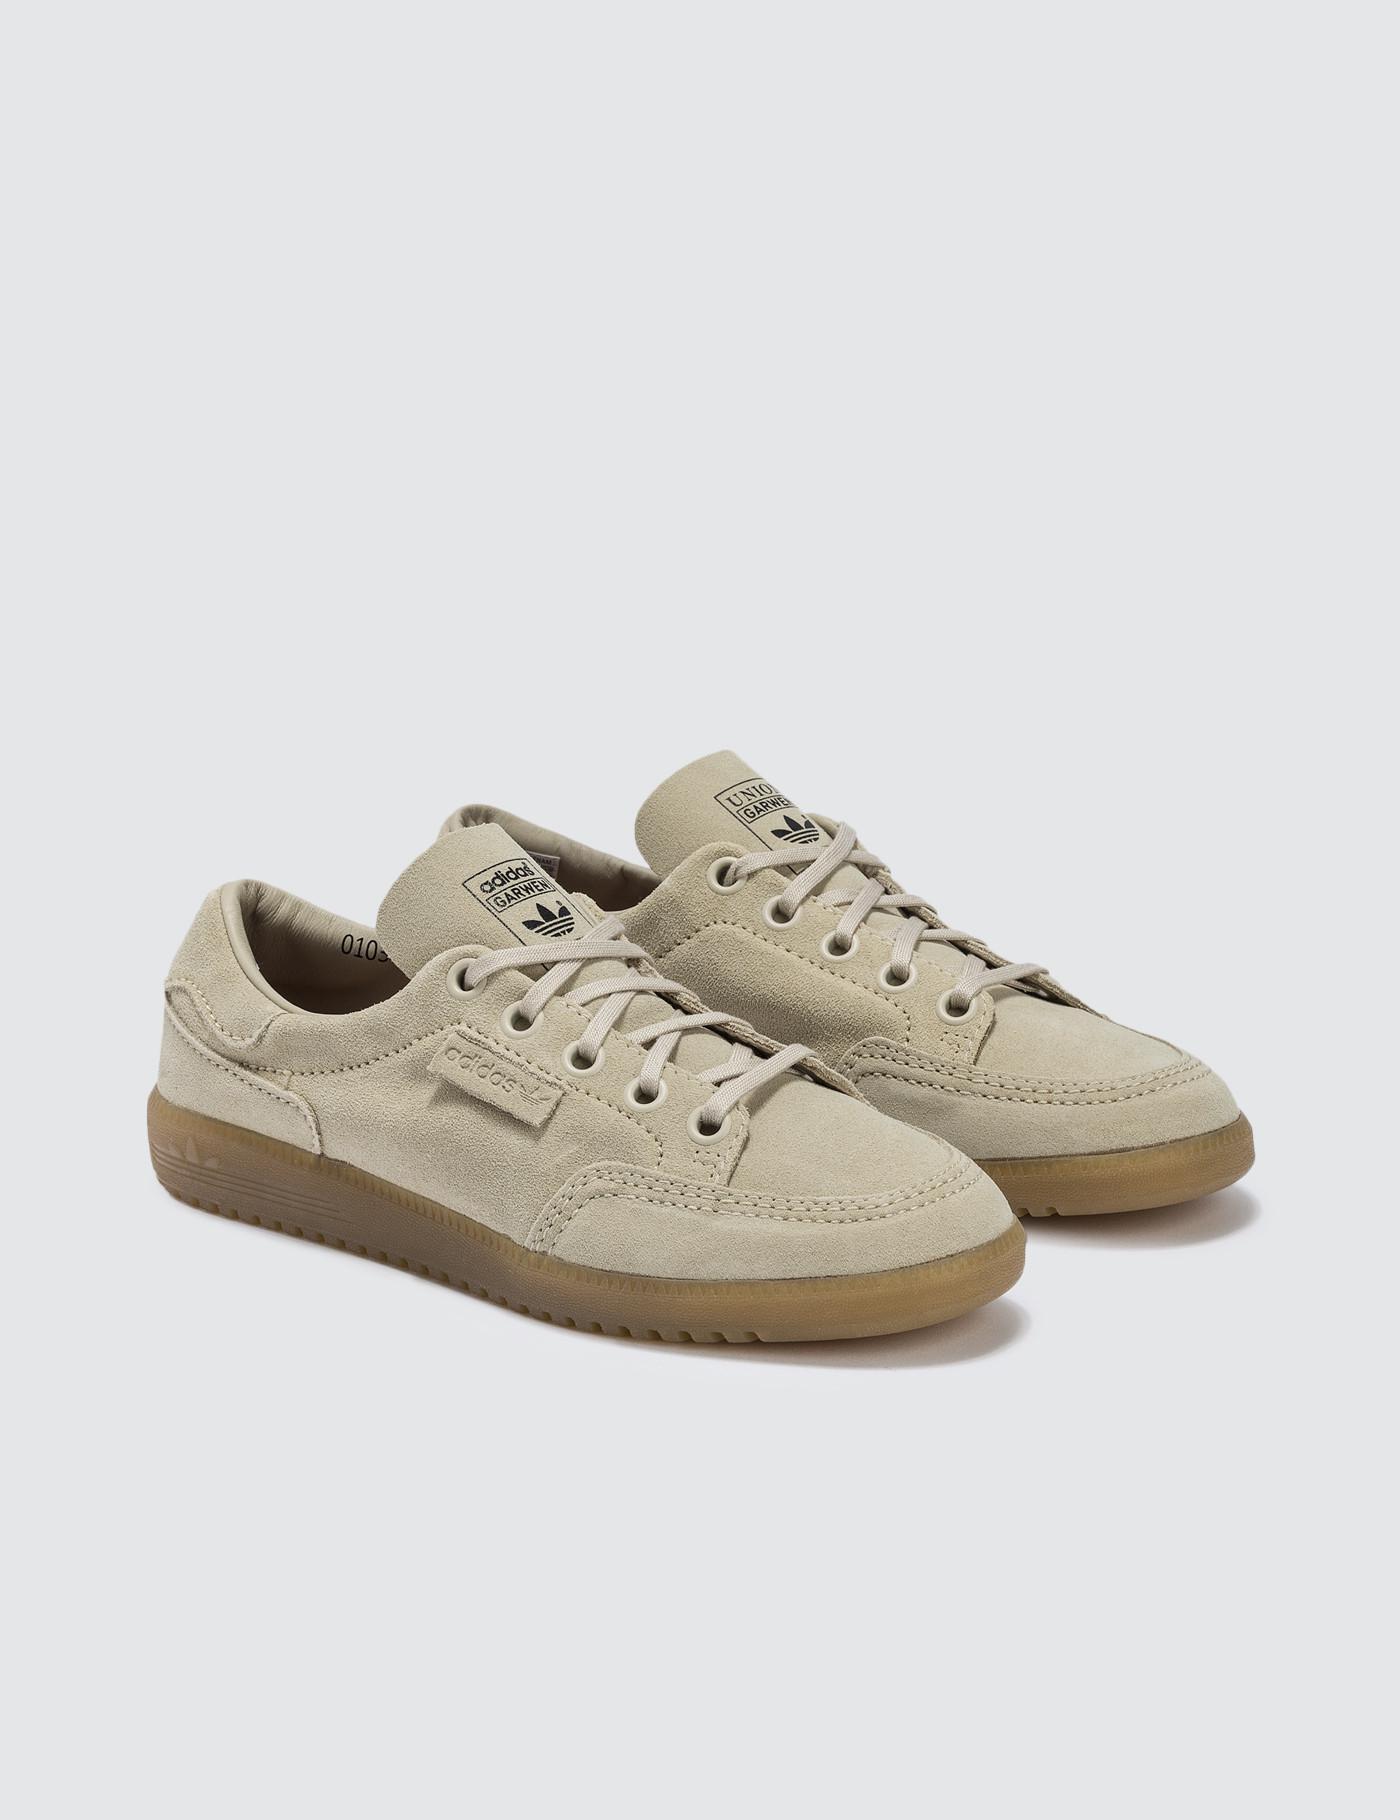 babe04c71ac Lyst - adidas Originals Union La X Adidas Spezial Garwen Spzl in ...